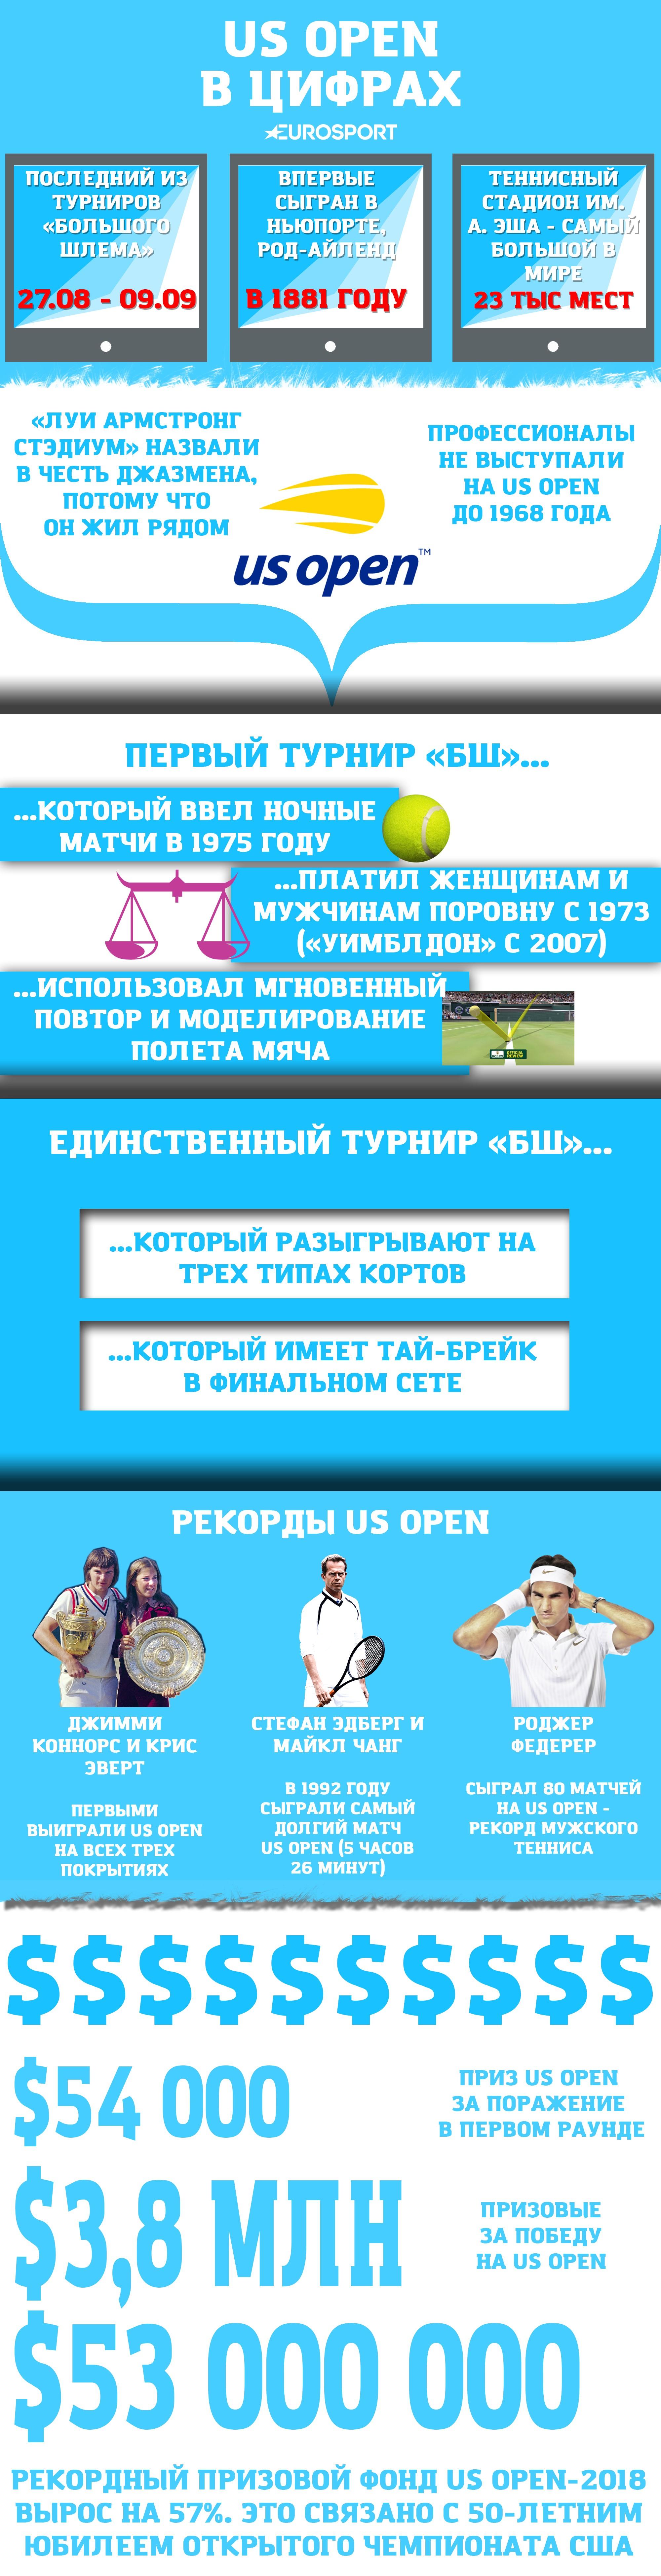 ÐнÑогÑаÑика US Open